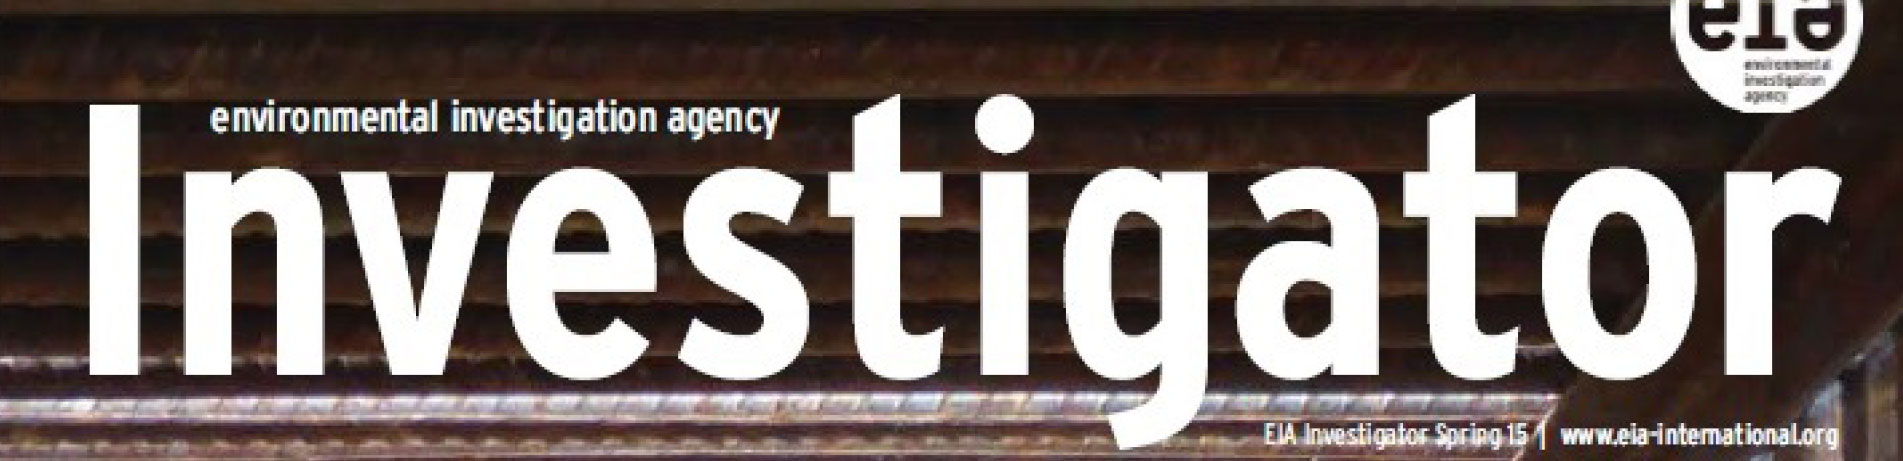 Masthead for the Spring 2015 Investigator Magazine